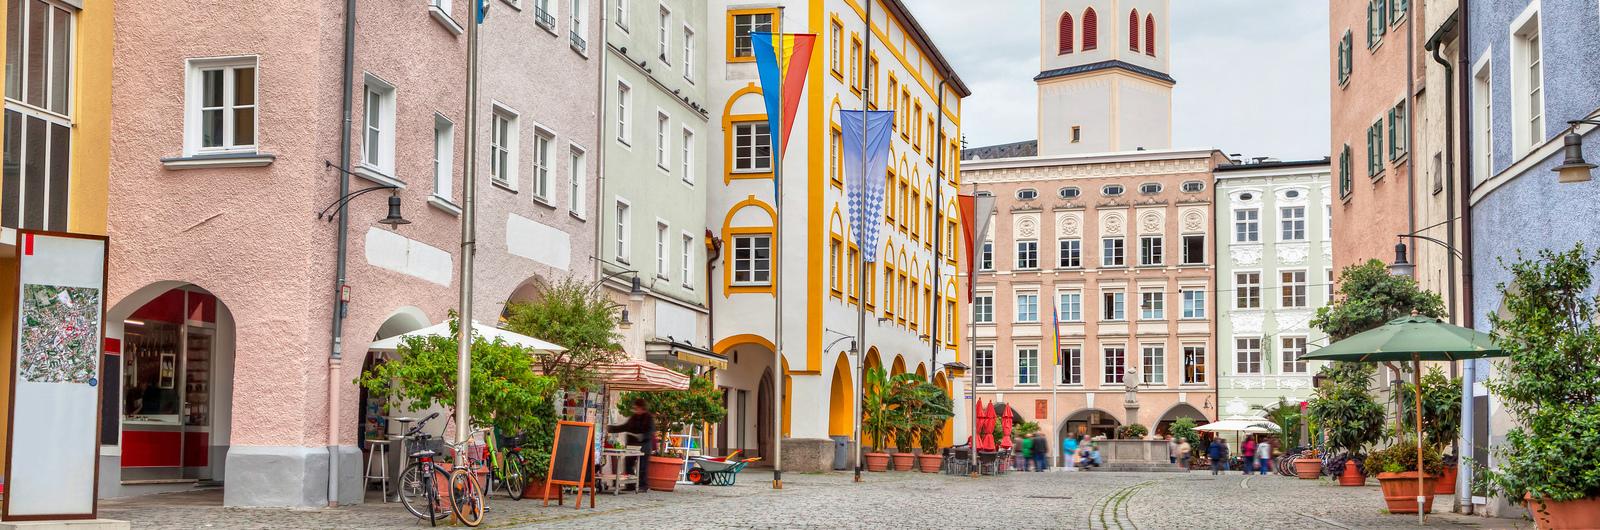 rosenheim city header